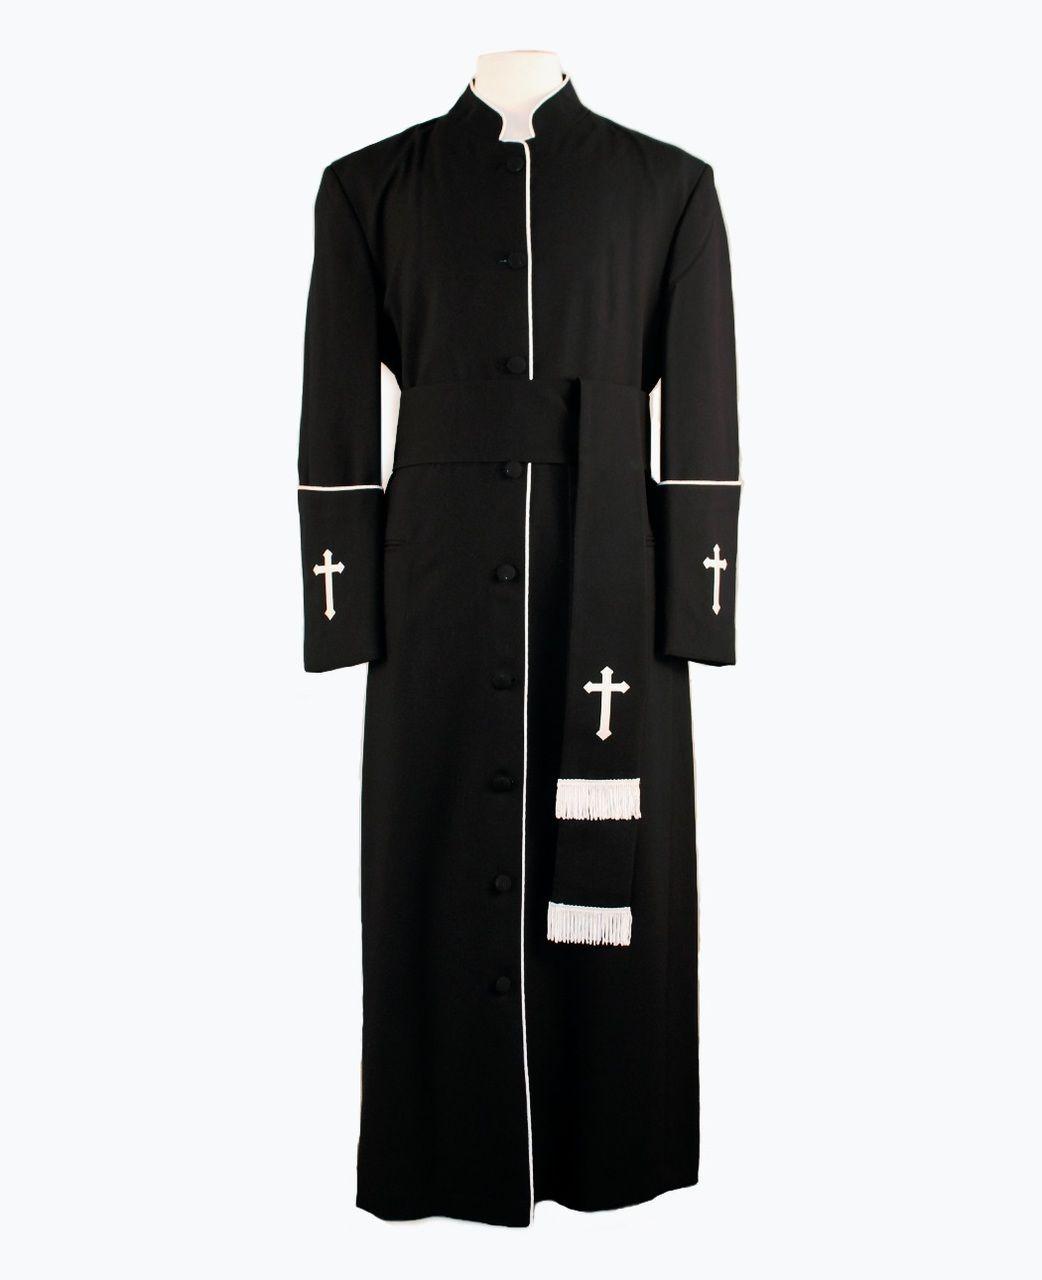 005. Men\'s Preacher Clergy Robe & Cincture Set in Black & White ...